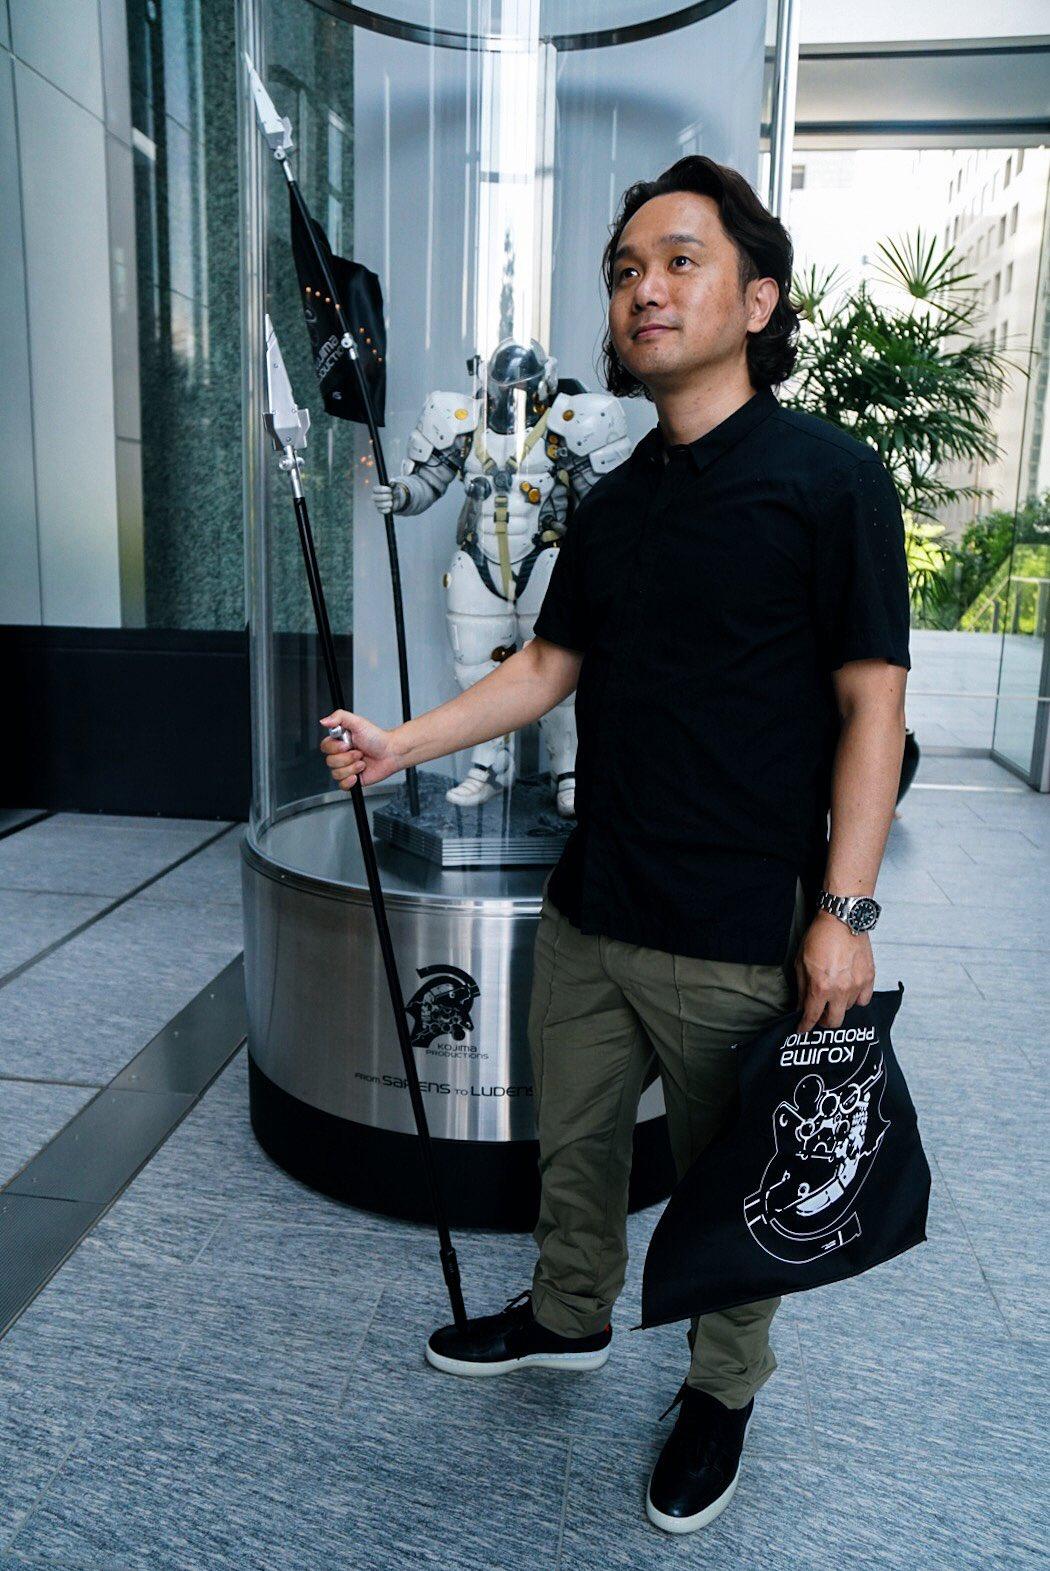 Yoji Shinkawa réparant la statuette de Ludens, le 12 juillet 2017